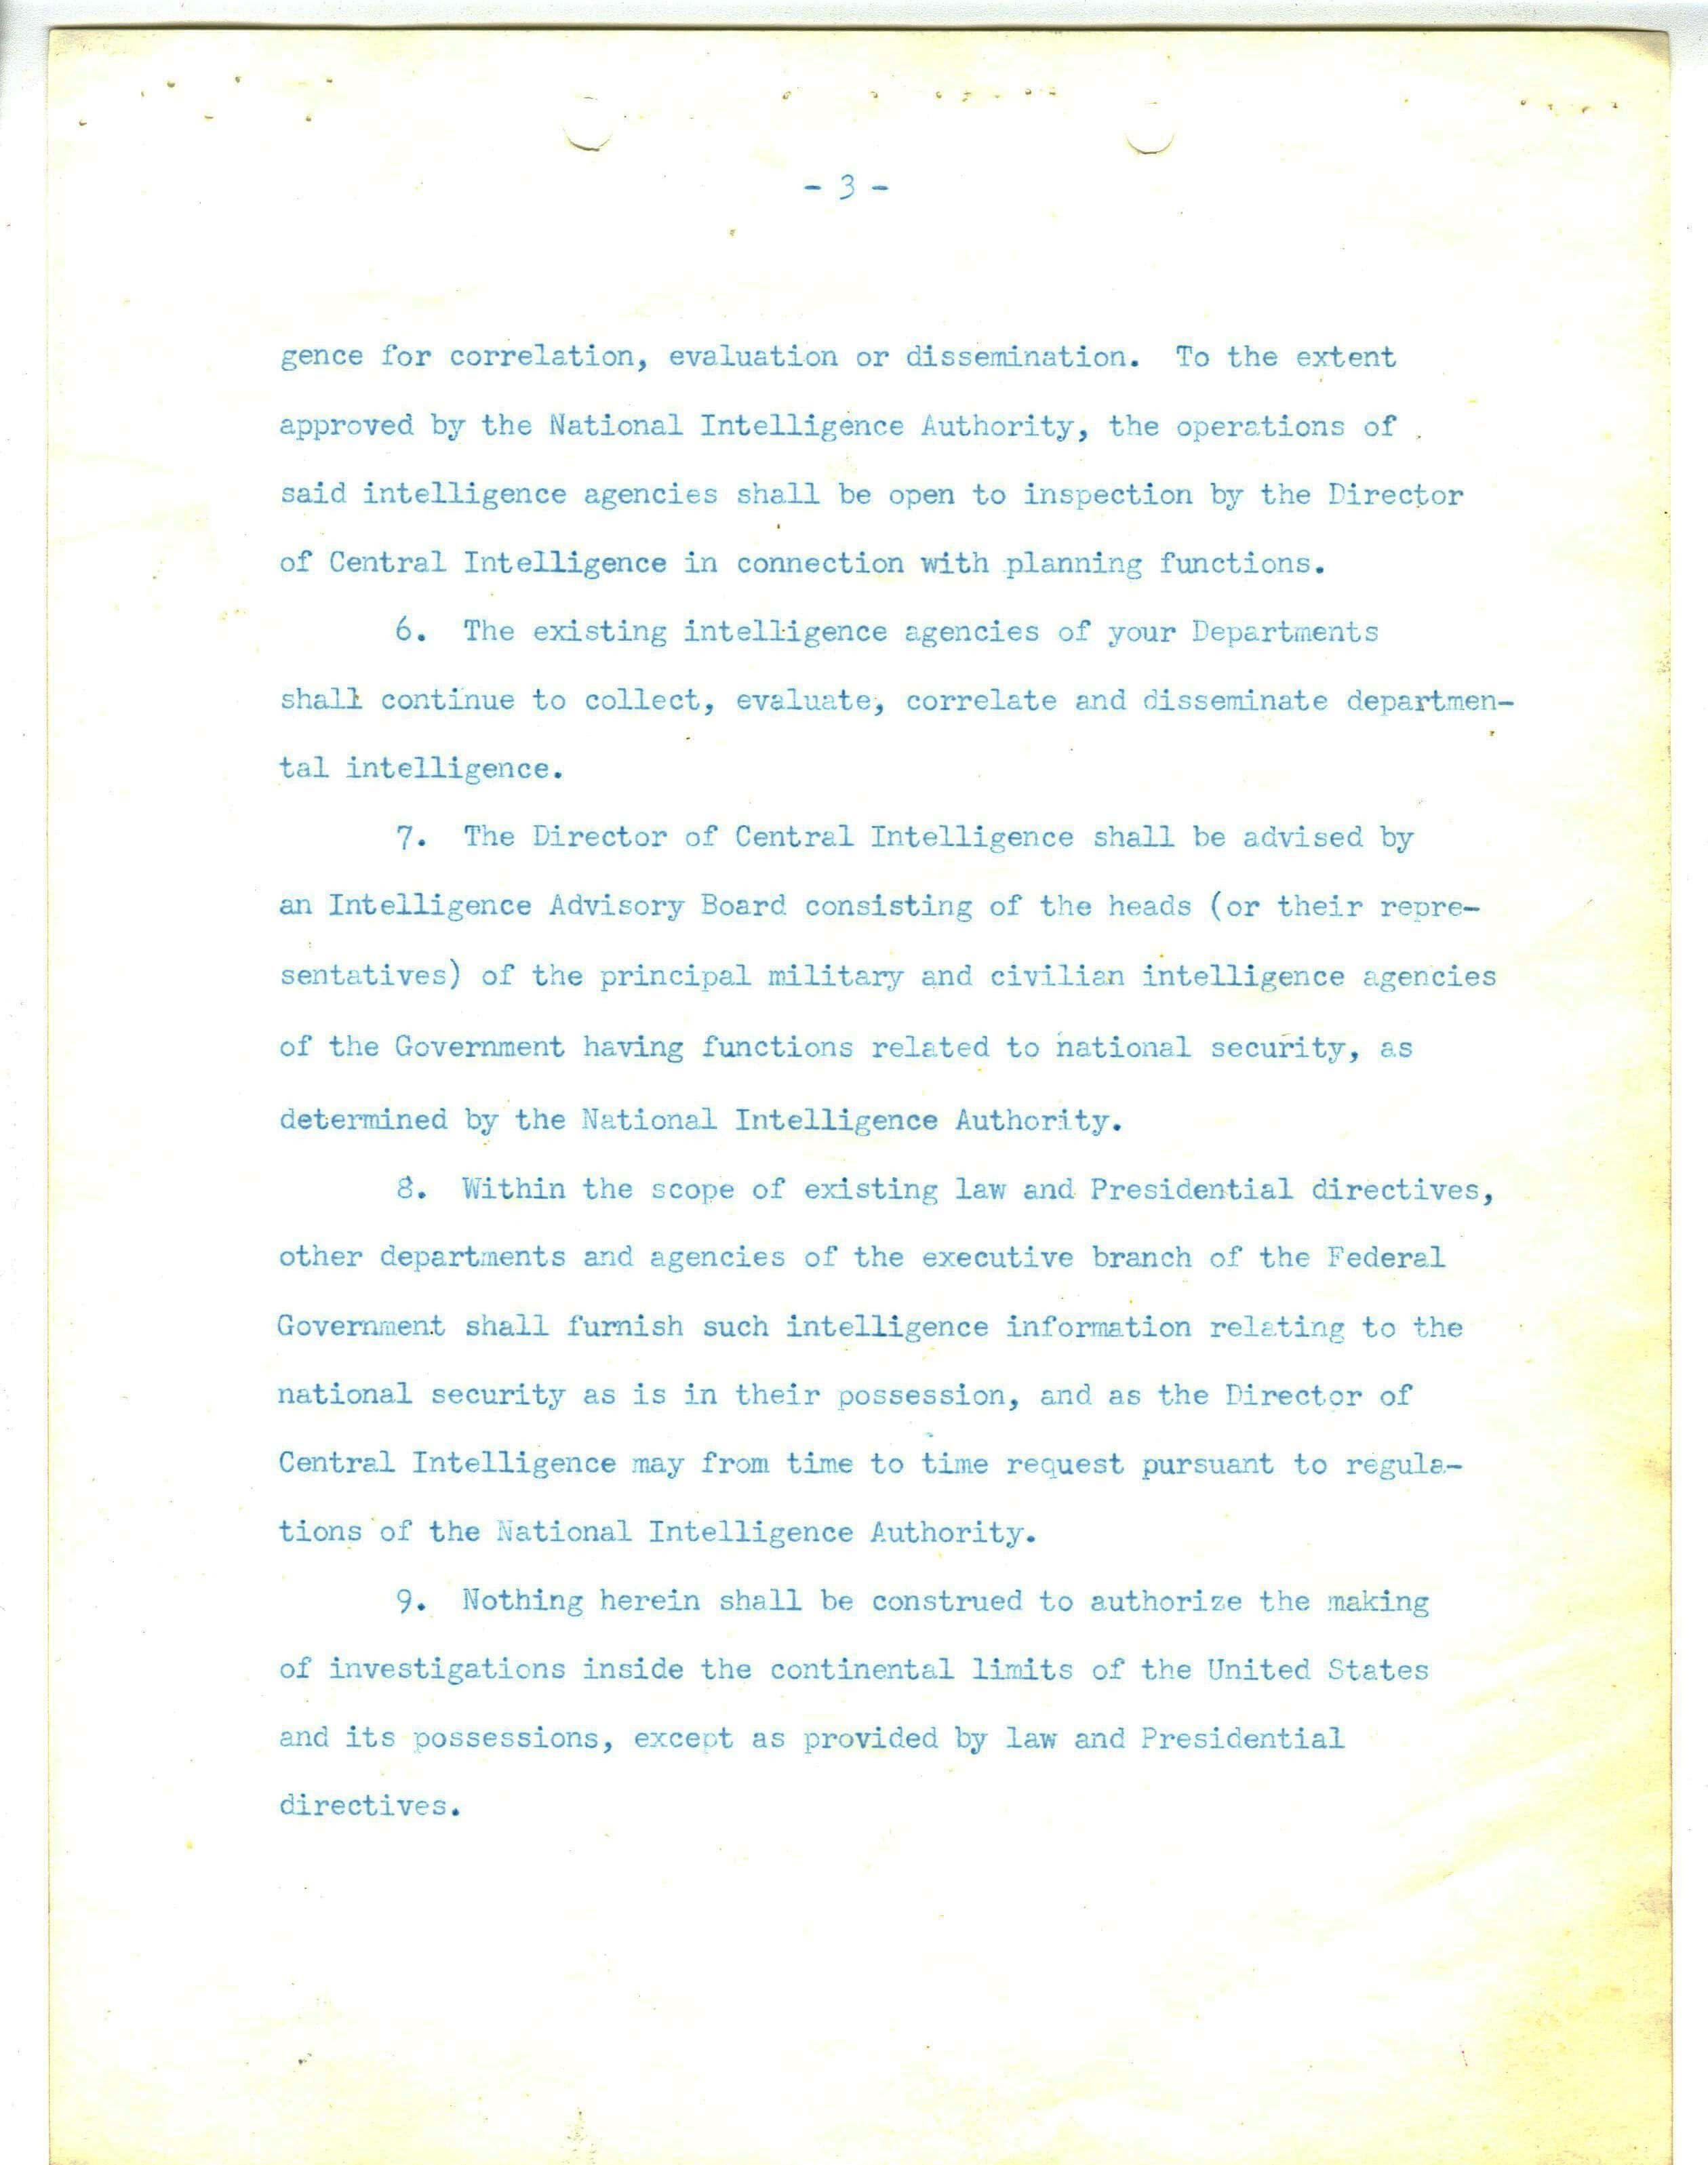 Jan 22 Document 3